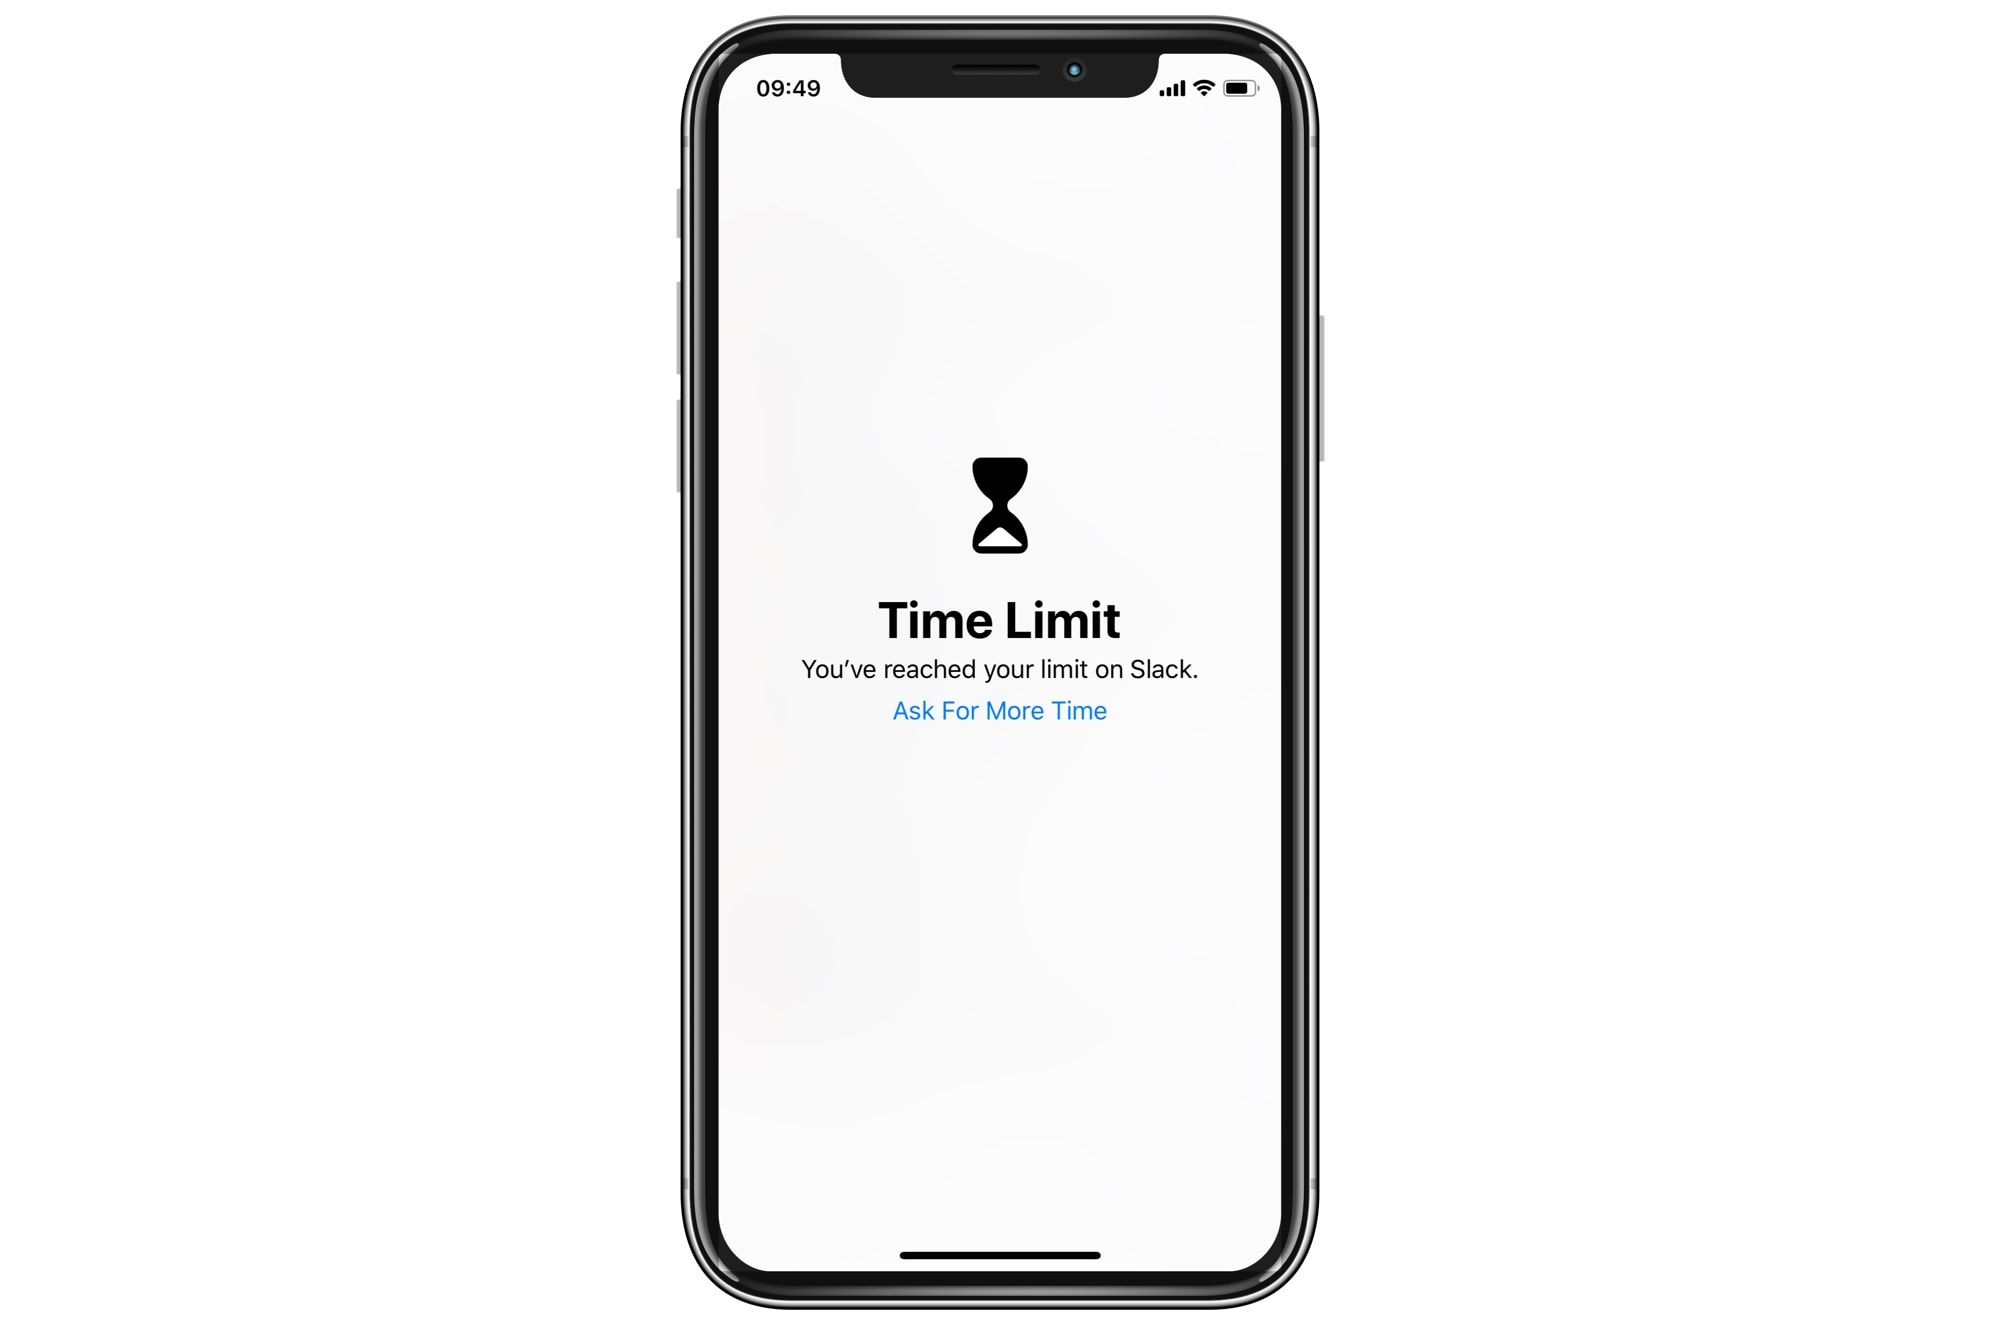 Screen time passcode lock